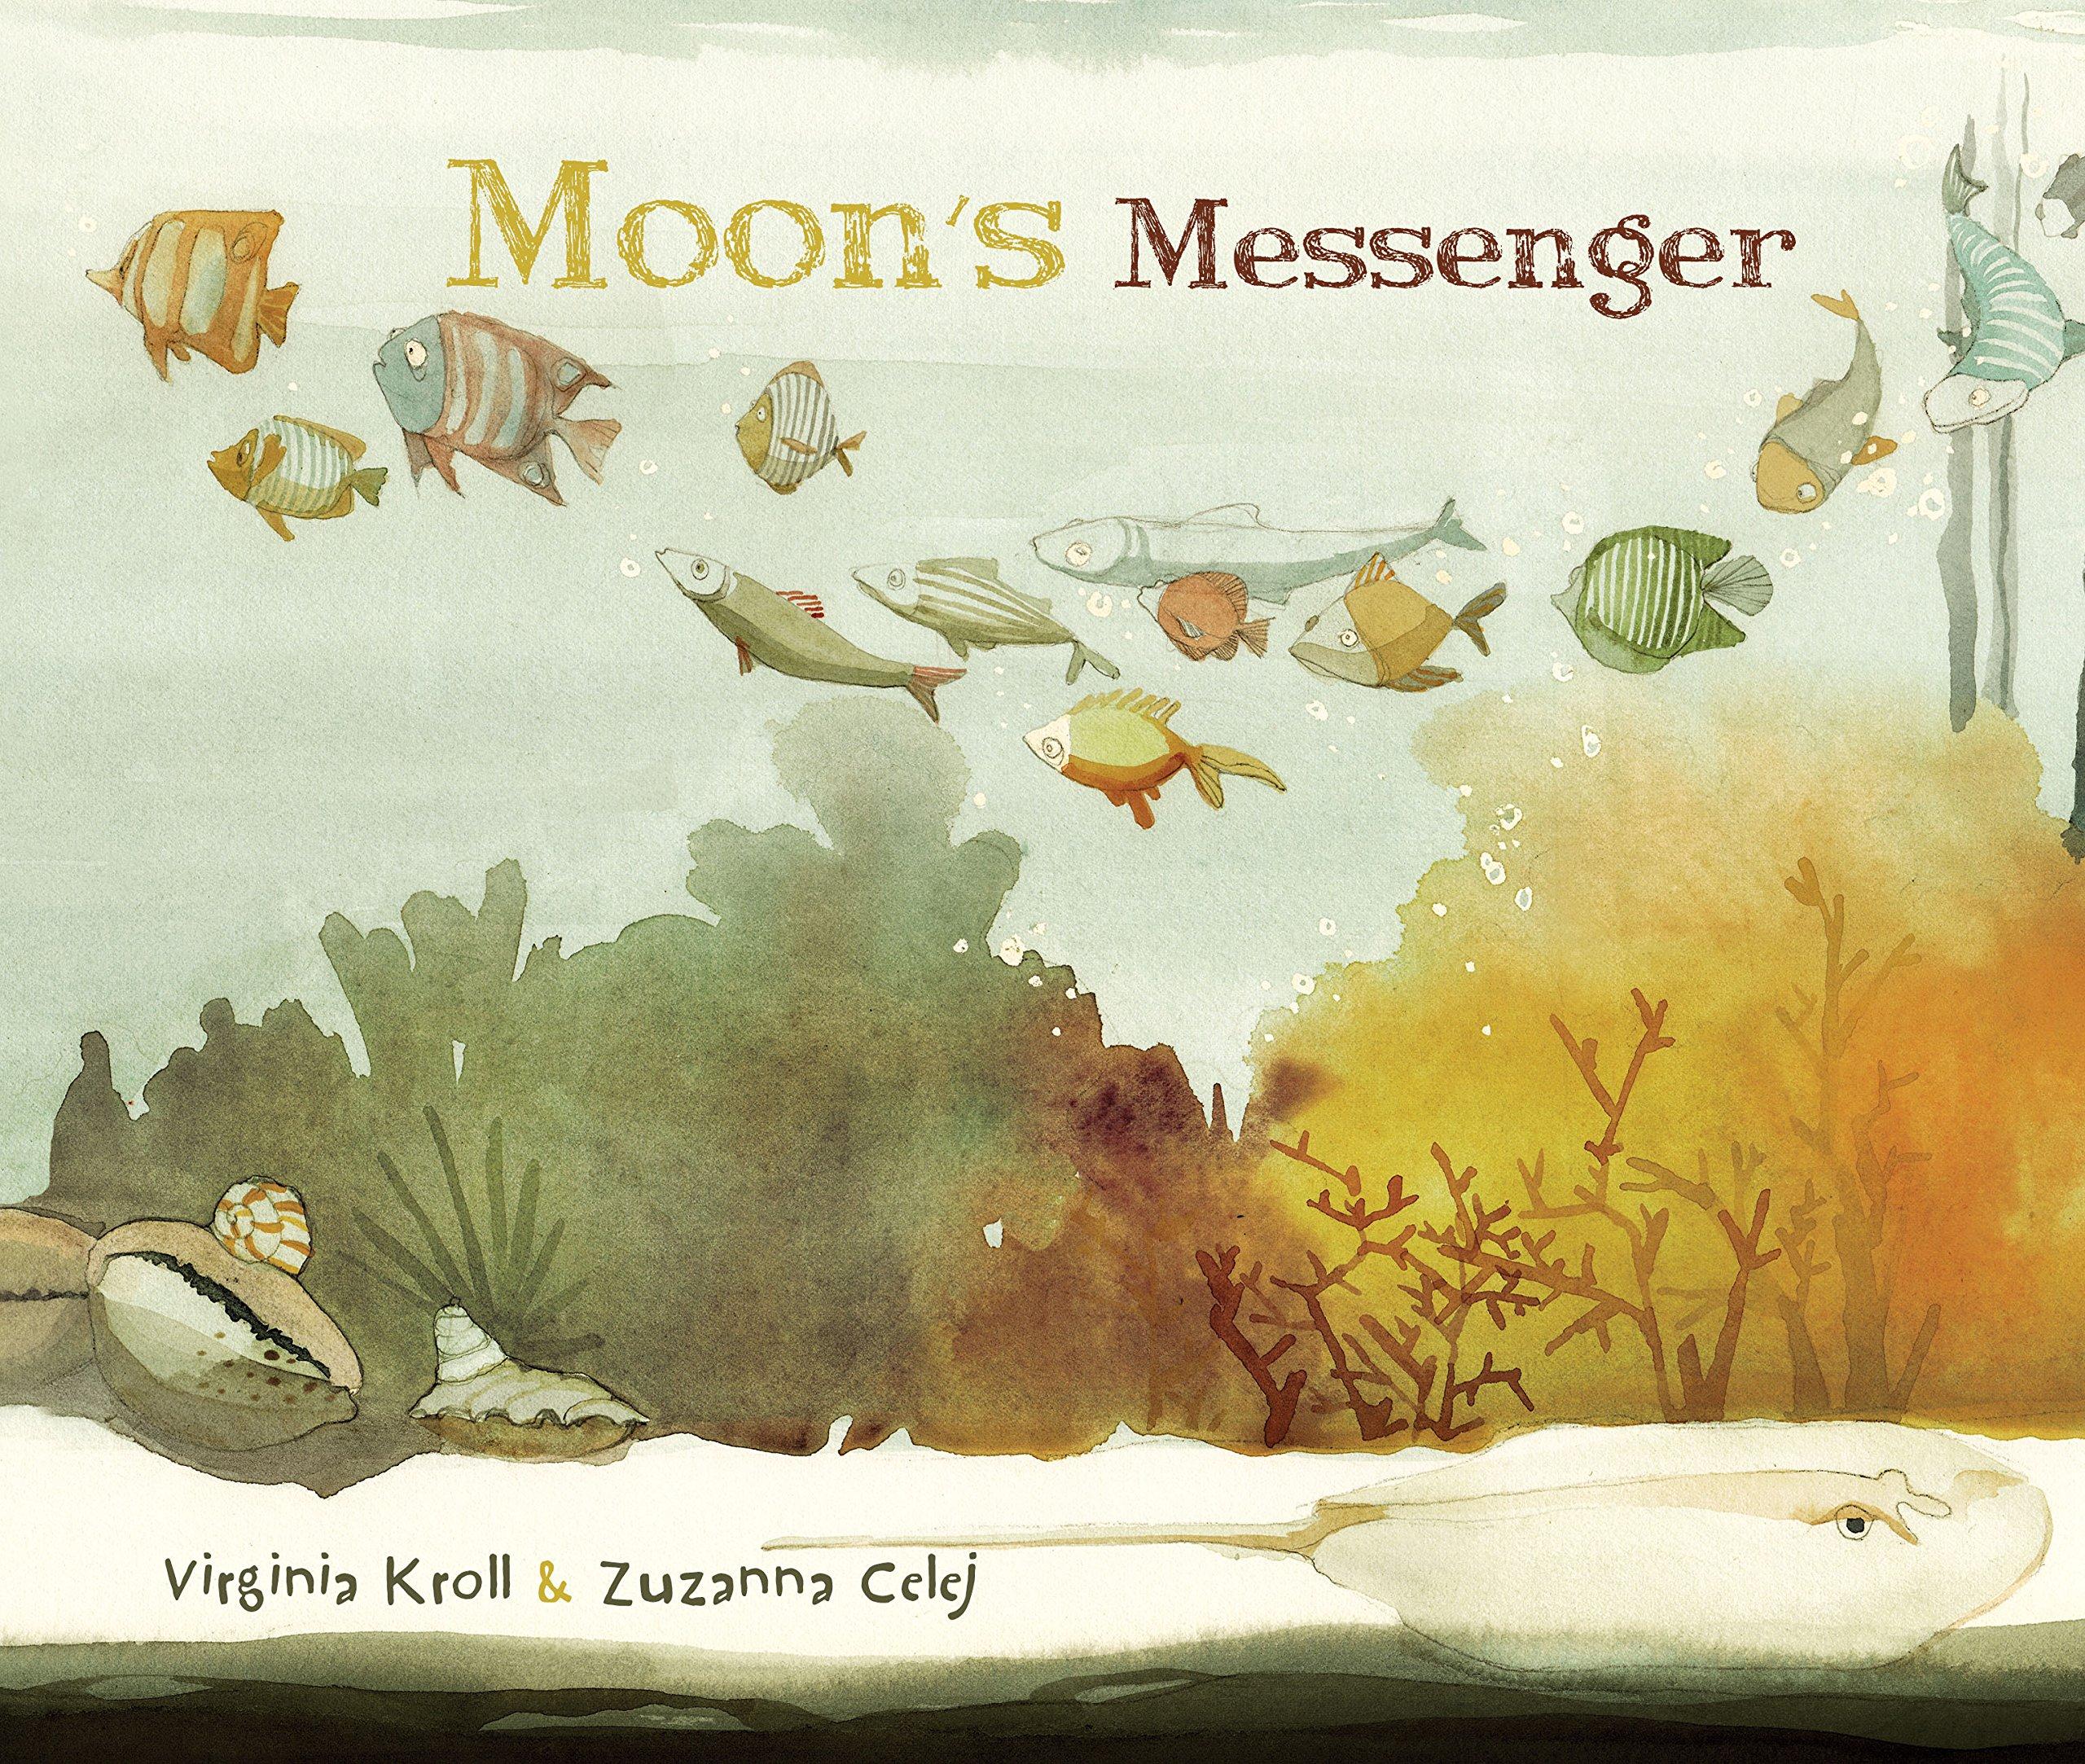 Moon's Messenger